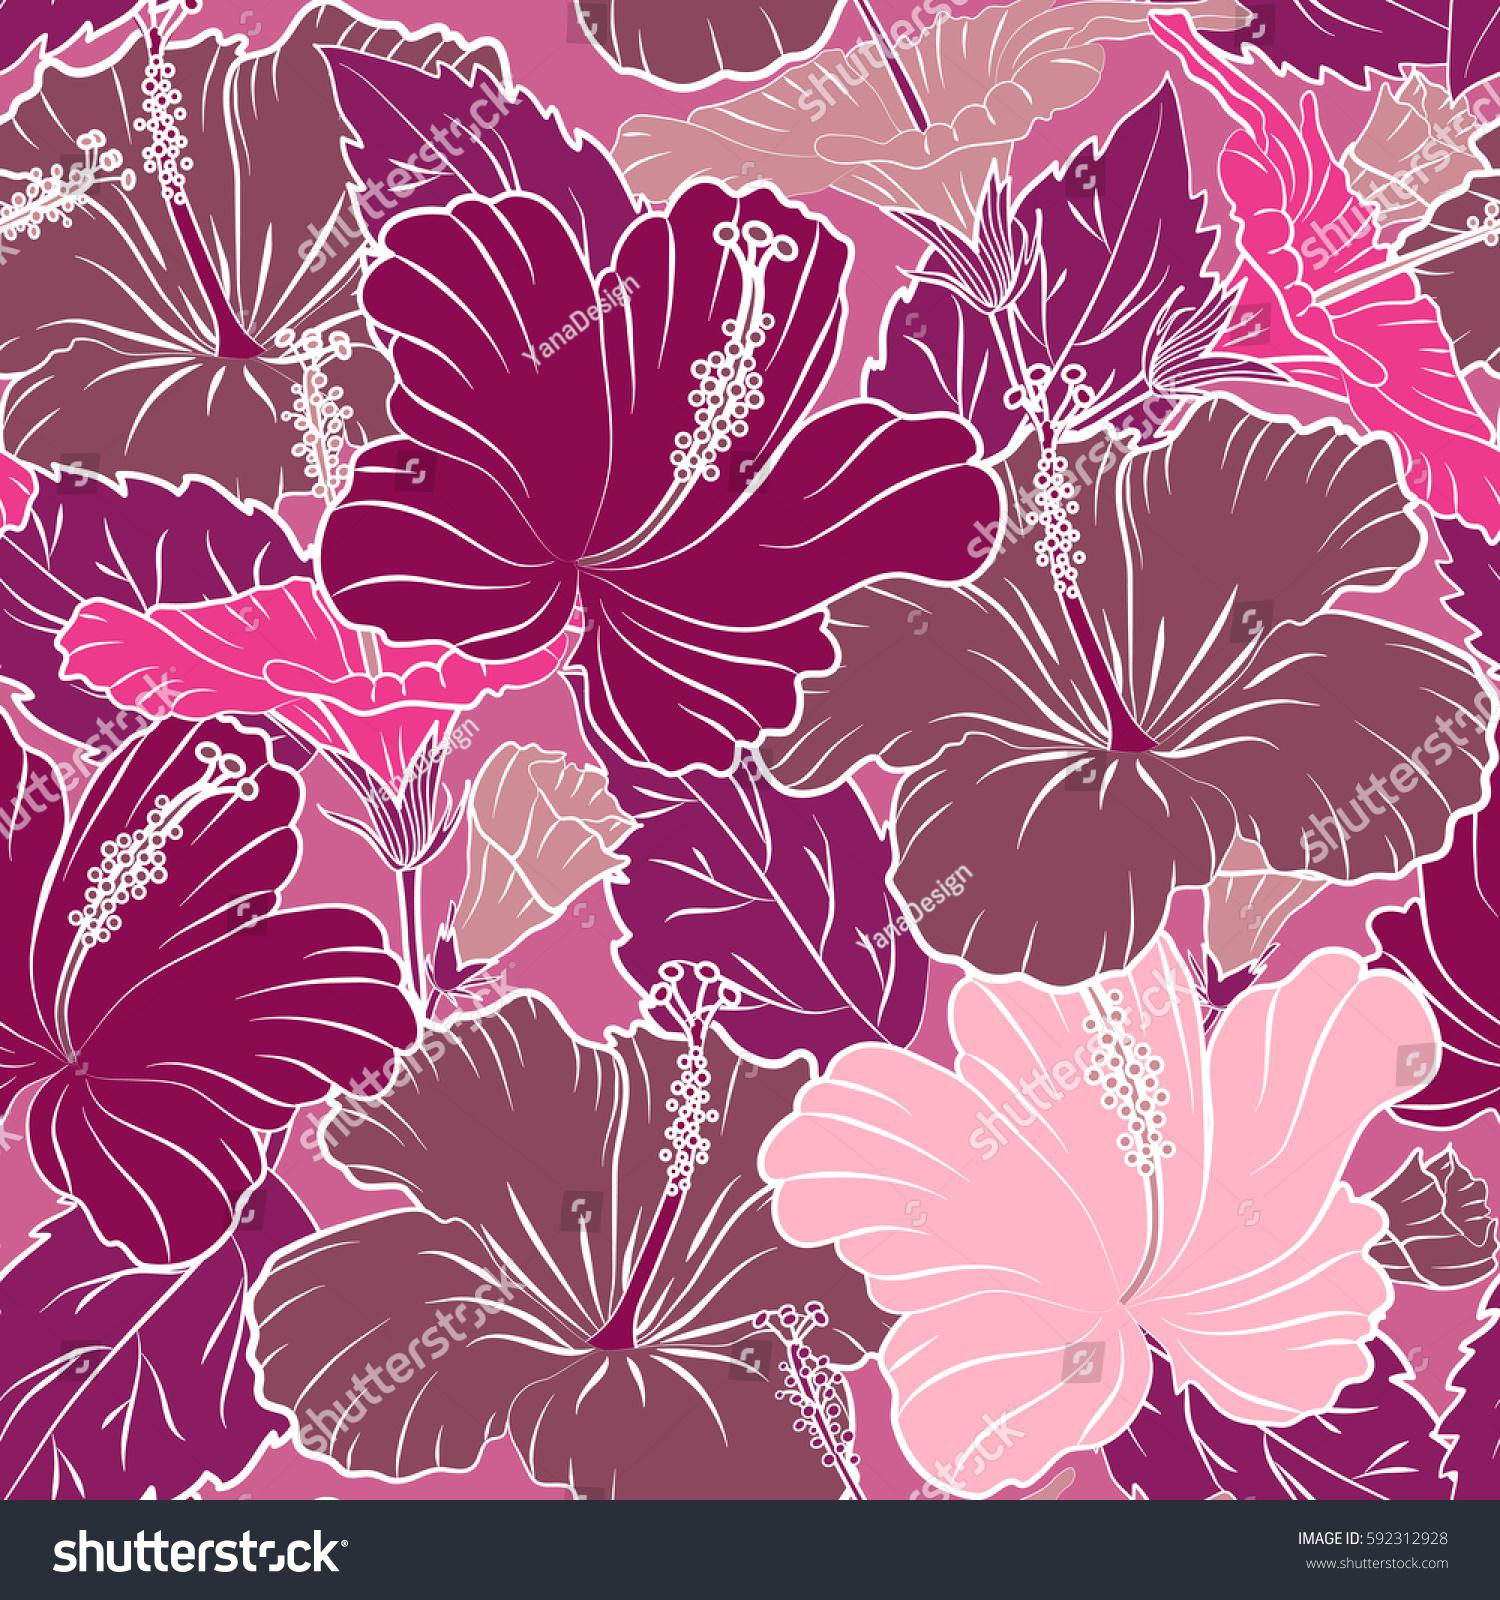 Elegant template fashion prints cute pattern stock illustration the elegant the template for fashion prints cute pattern in pink and purple hibiscus flowers izmirmasajfo